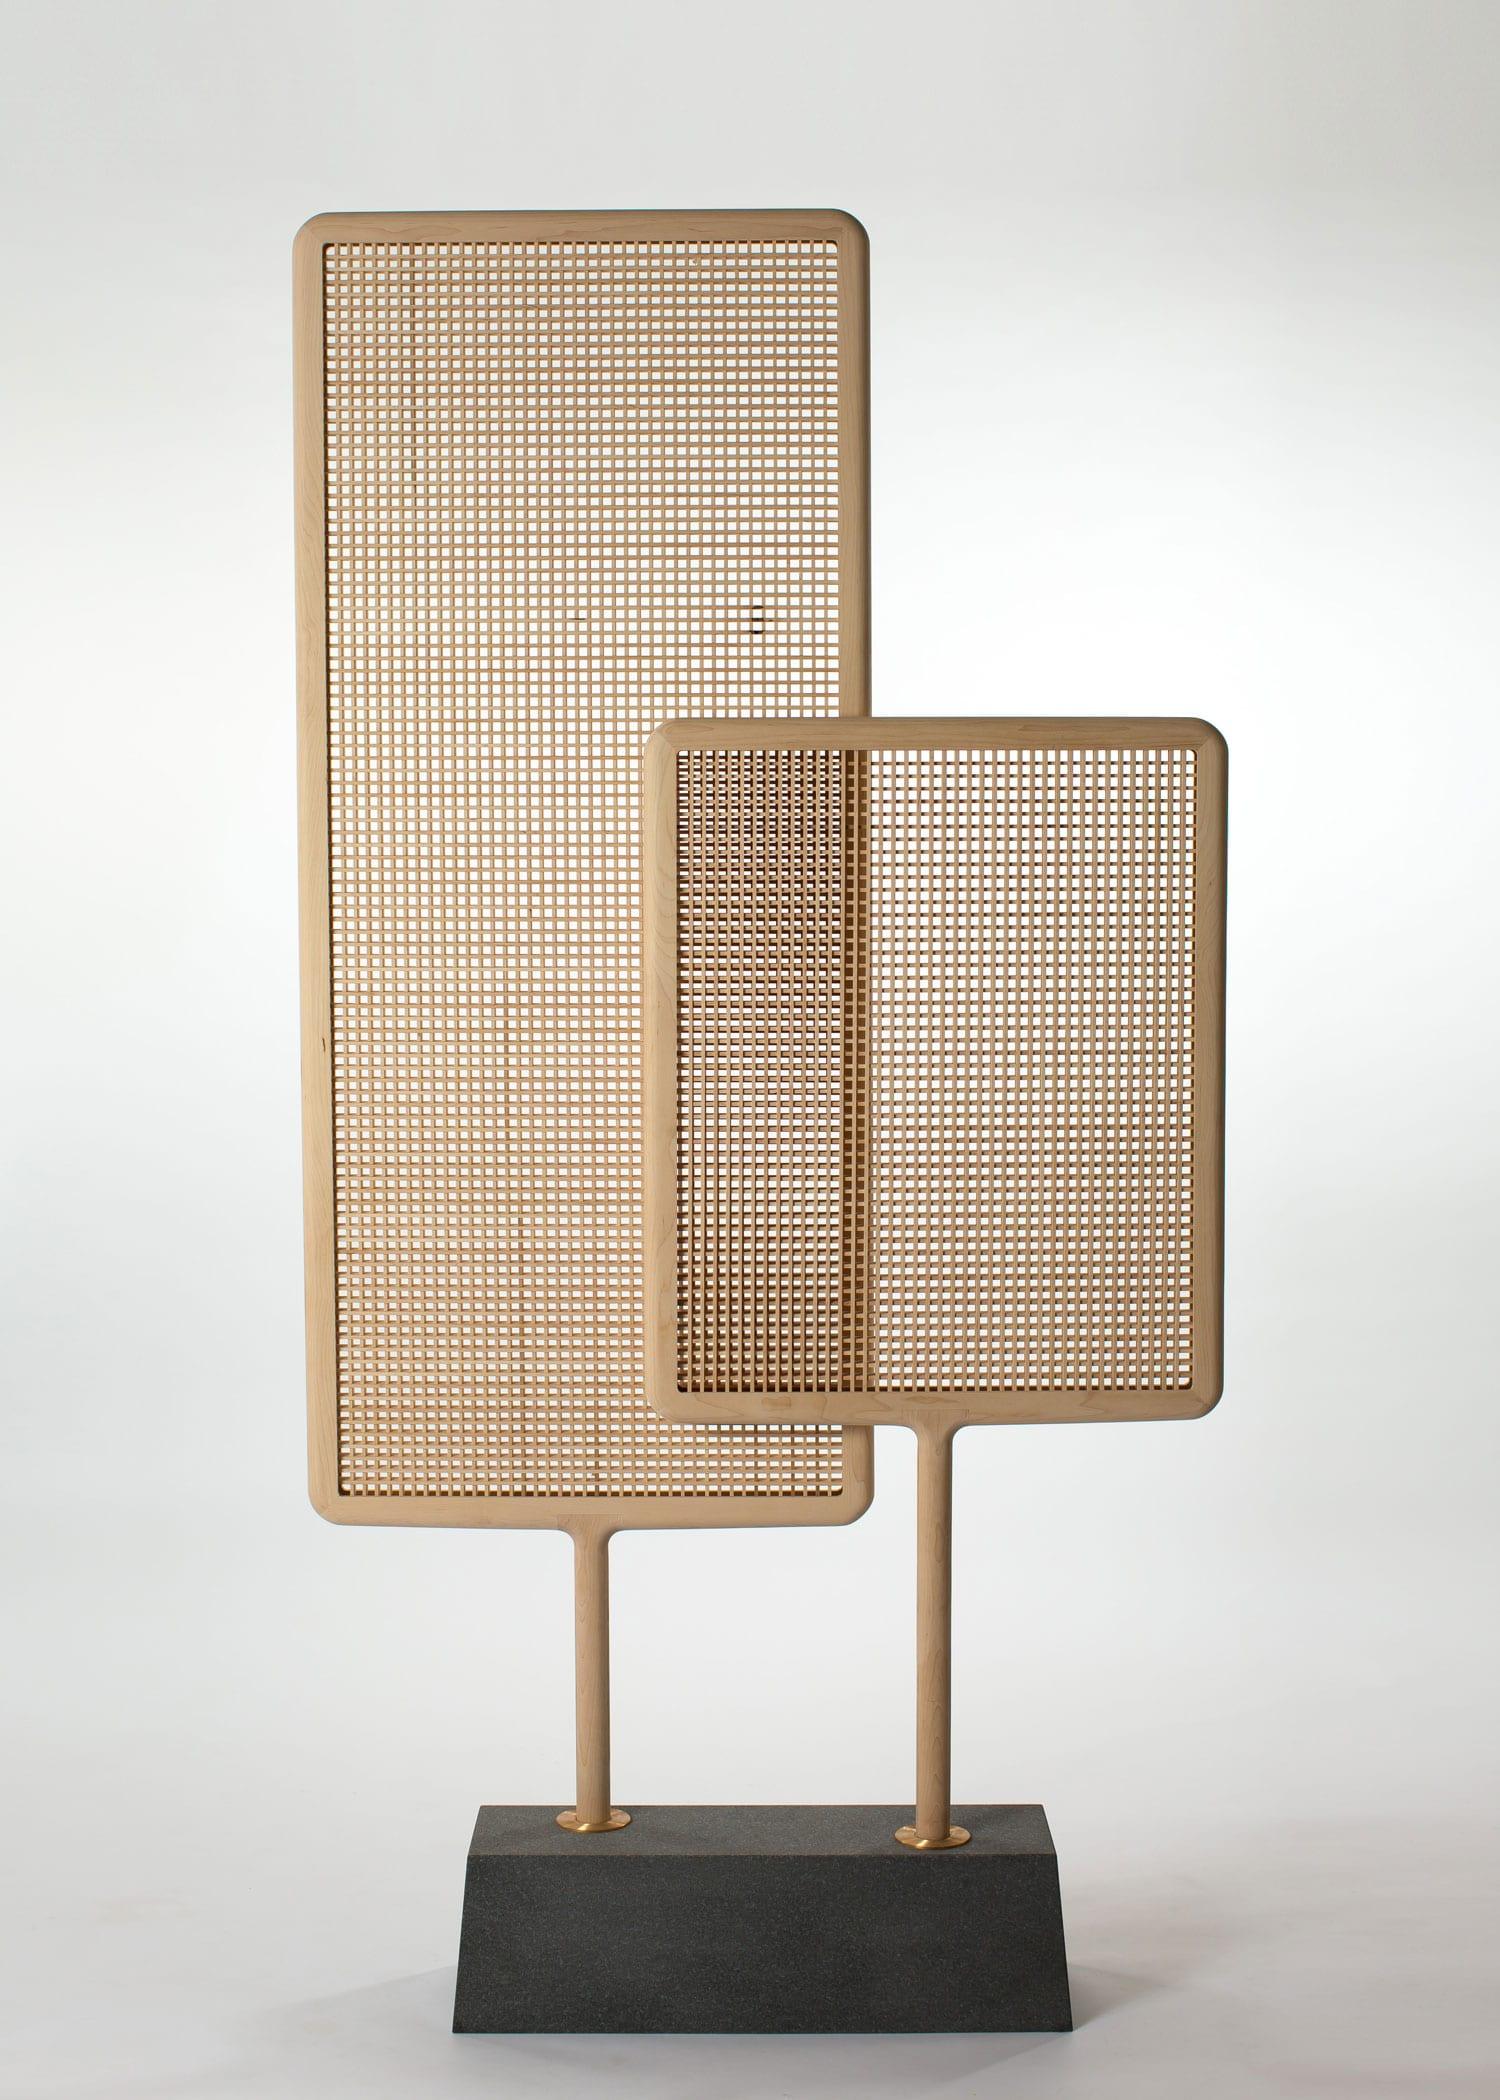 Australian Designers in Milan: Voyage Partition byNicholas Fuller | #Milantrace2018